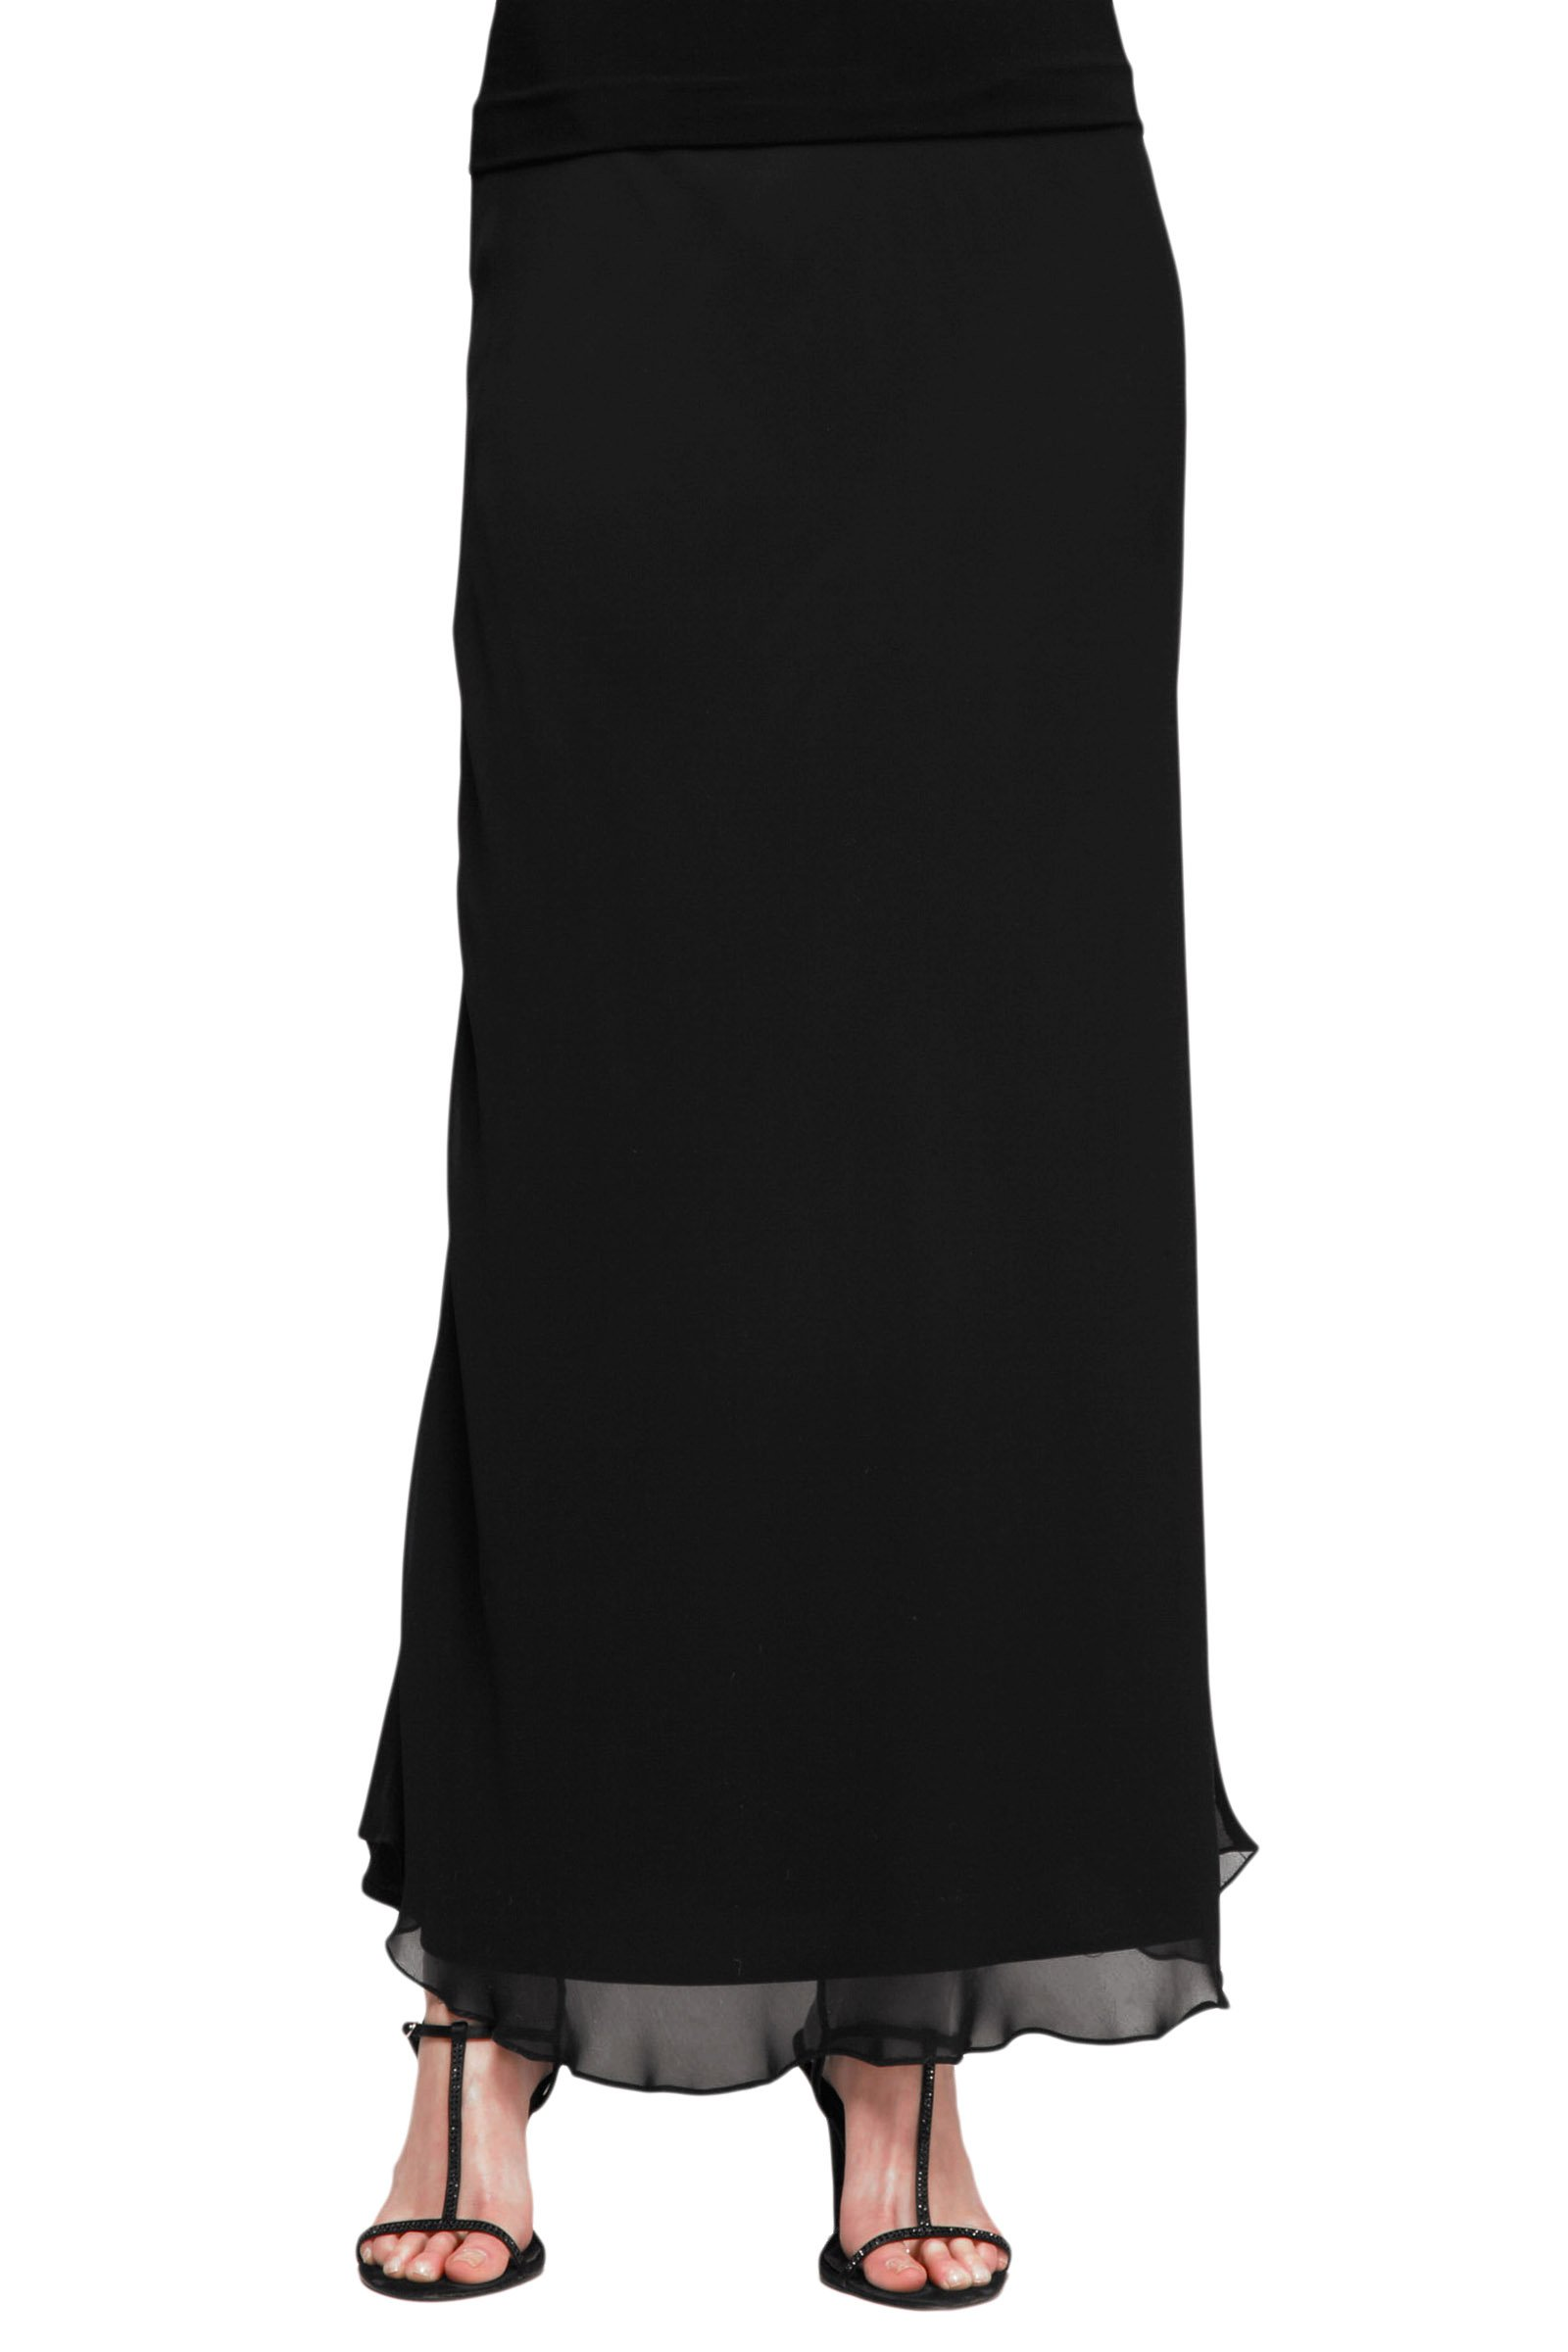 Alex Evenings Women's Petite Chiffon Skirt Various Styles (Regular Sizes), Black, XLP